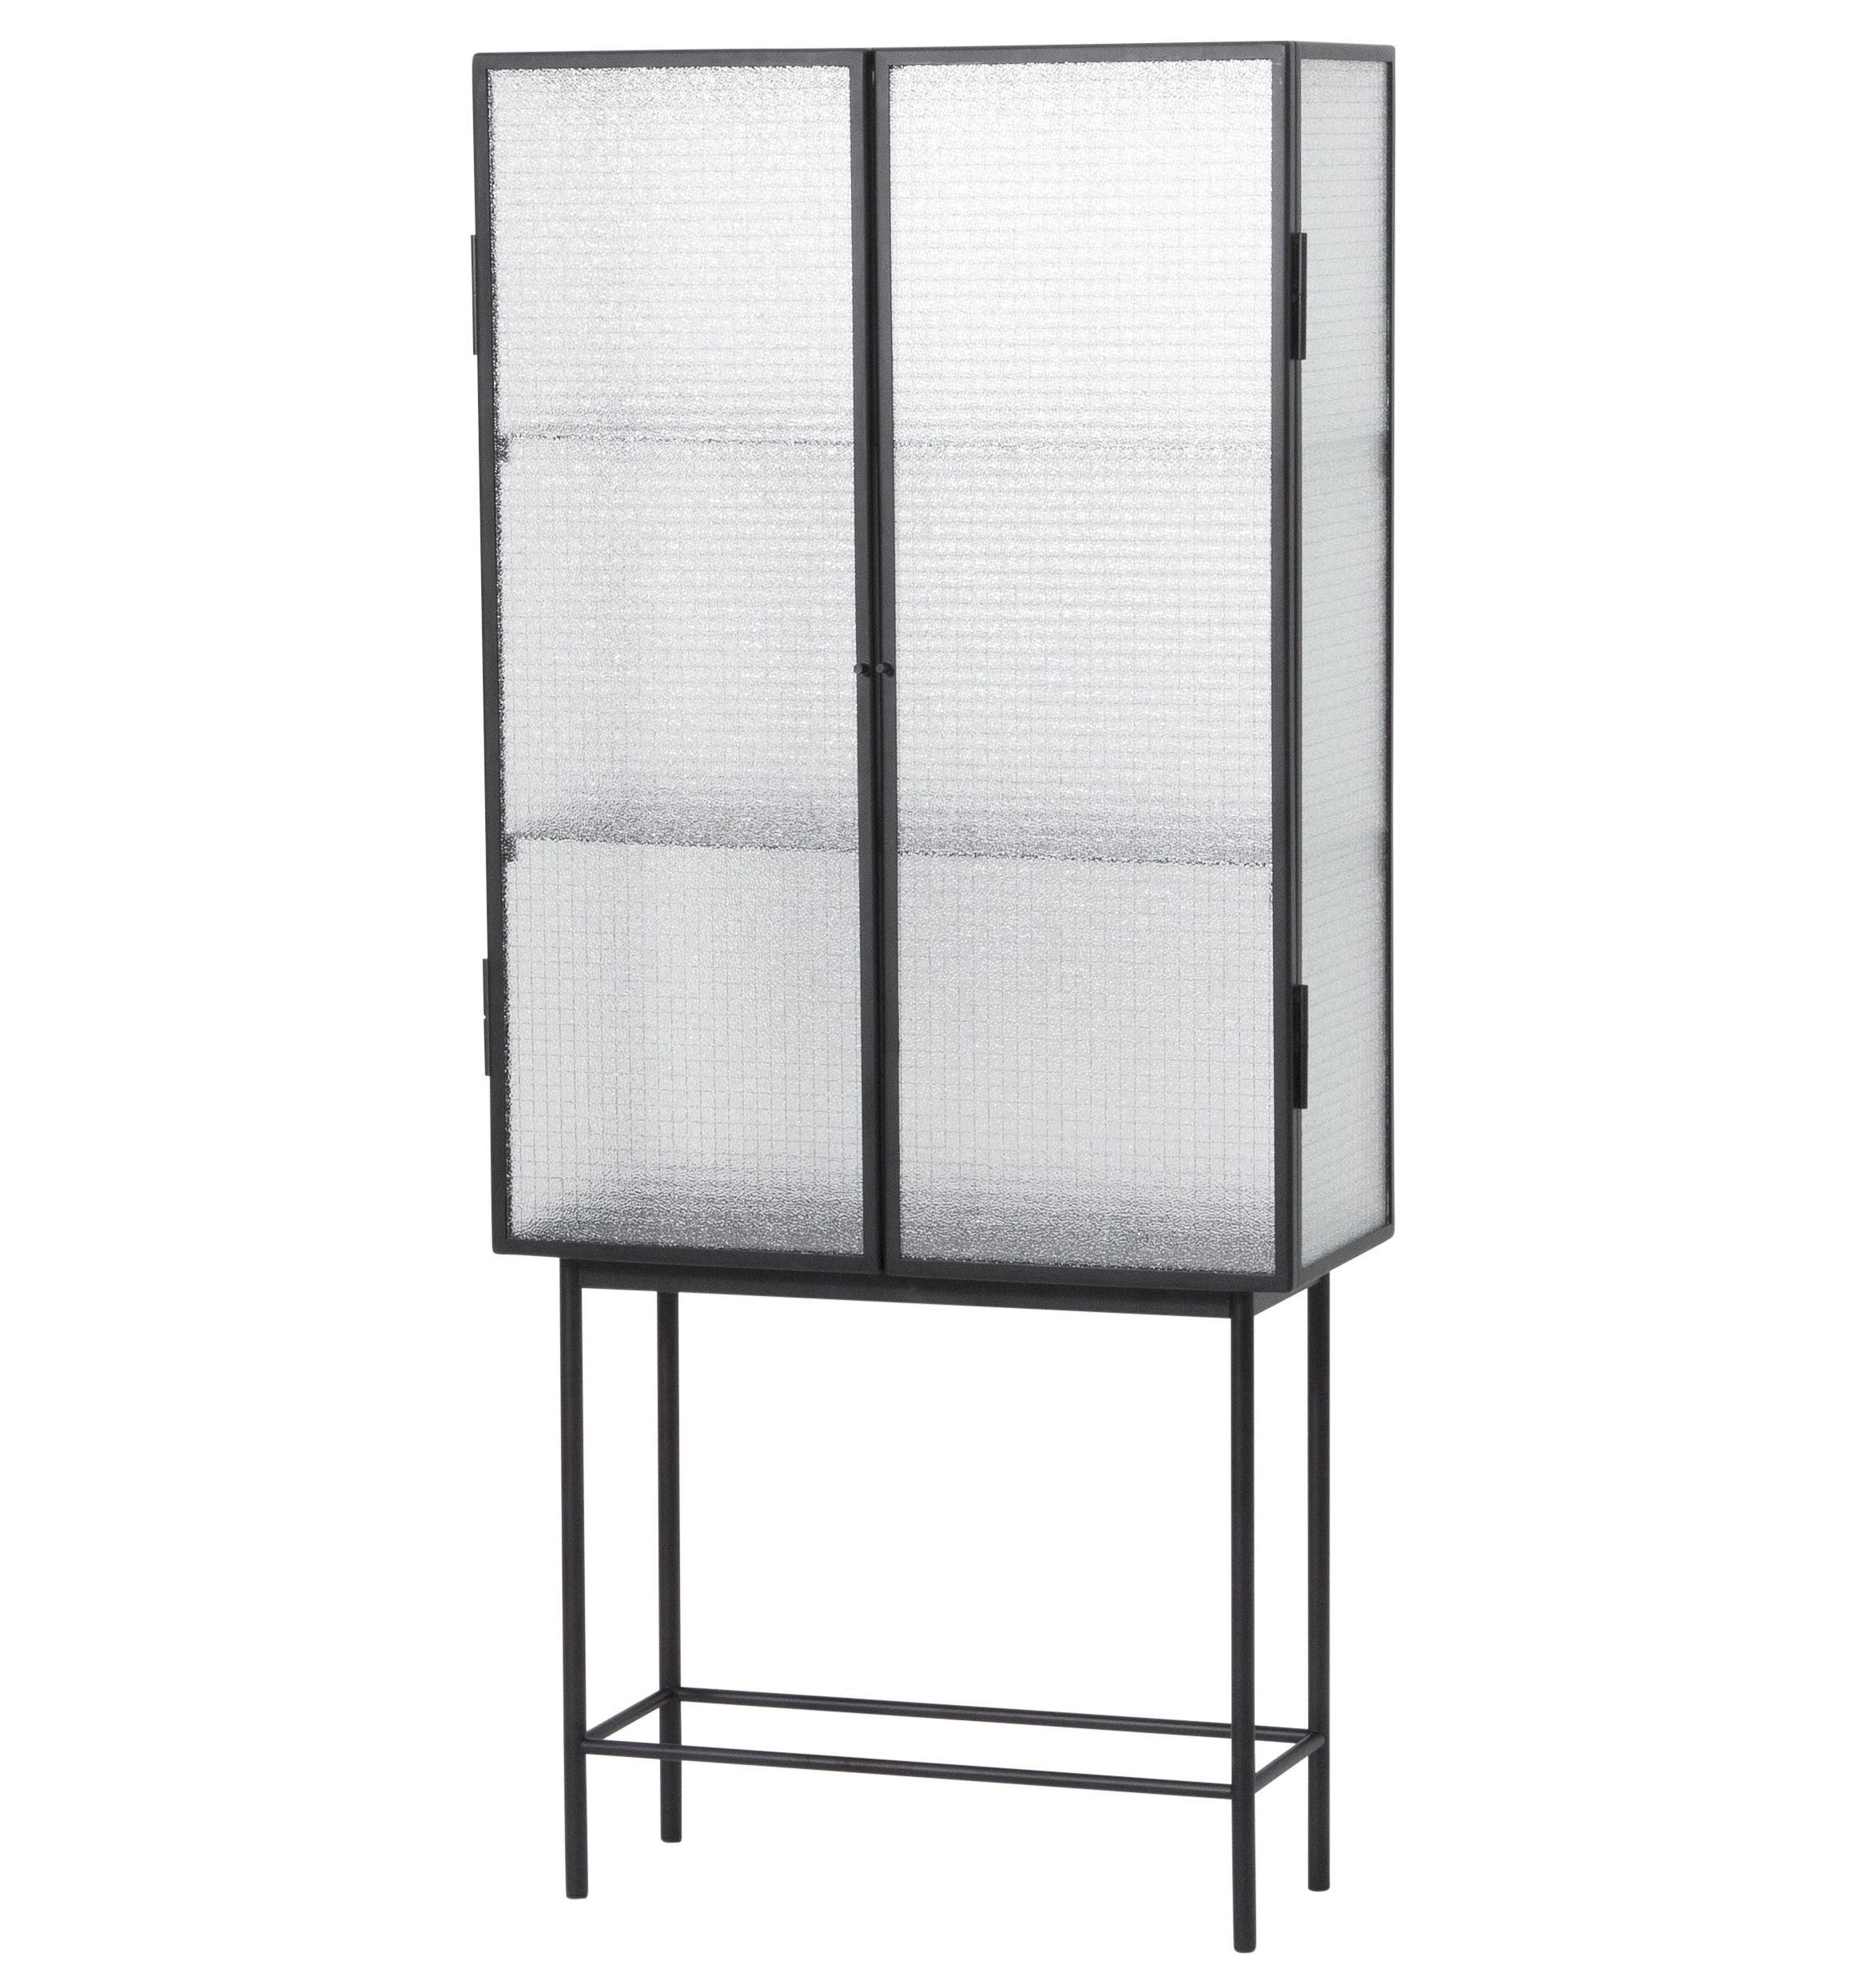 haze vitrine l 70 cm x h 155 cm drahtglas metall transparentes glas schwarz by ferm. Black Bedroom Furniture Sets. Home Design Ideas